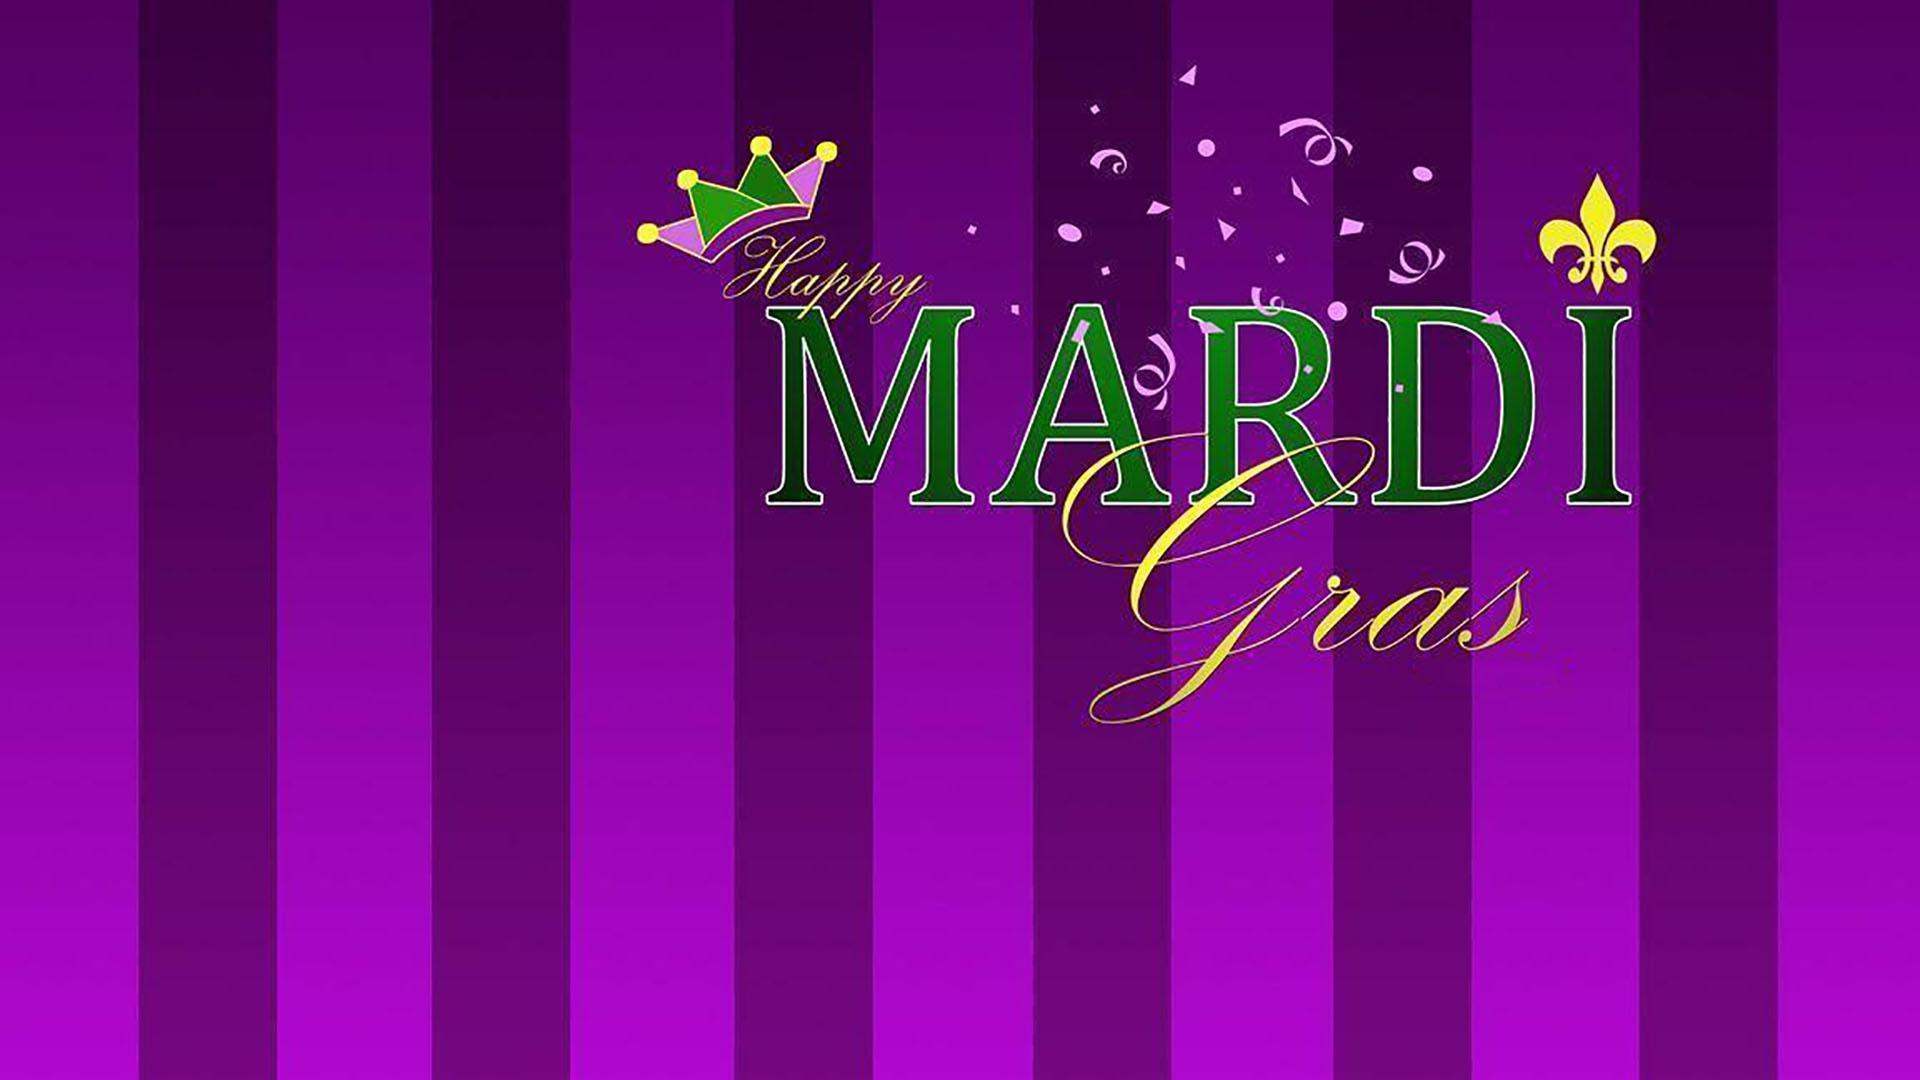 February 16 Mardi Gras Digital Signage Graphic